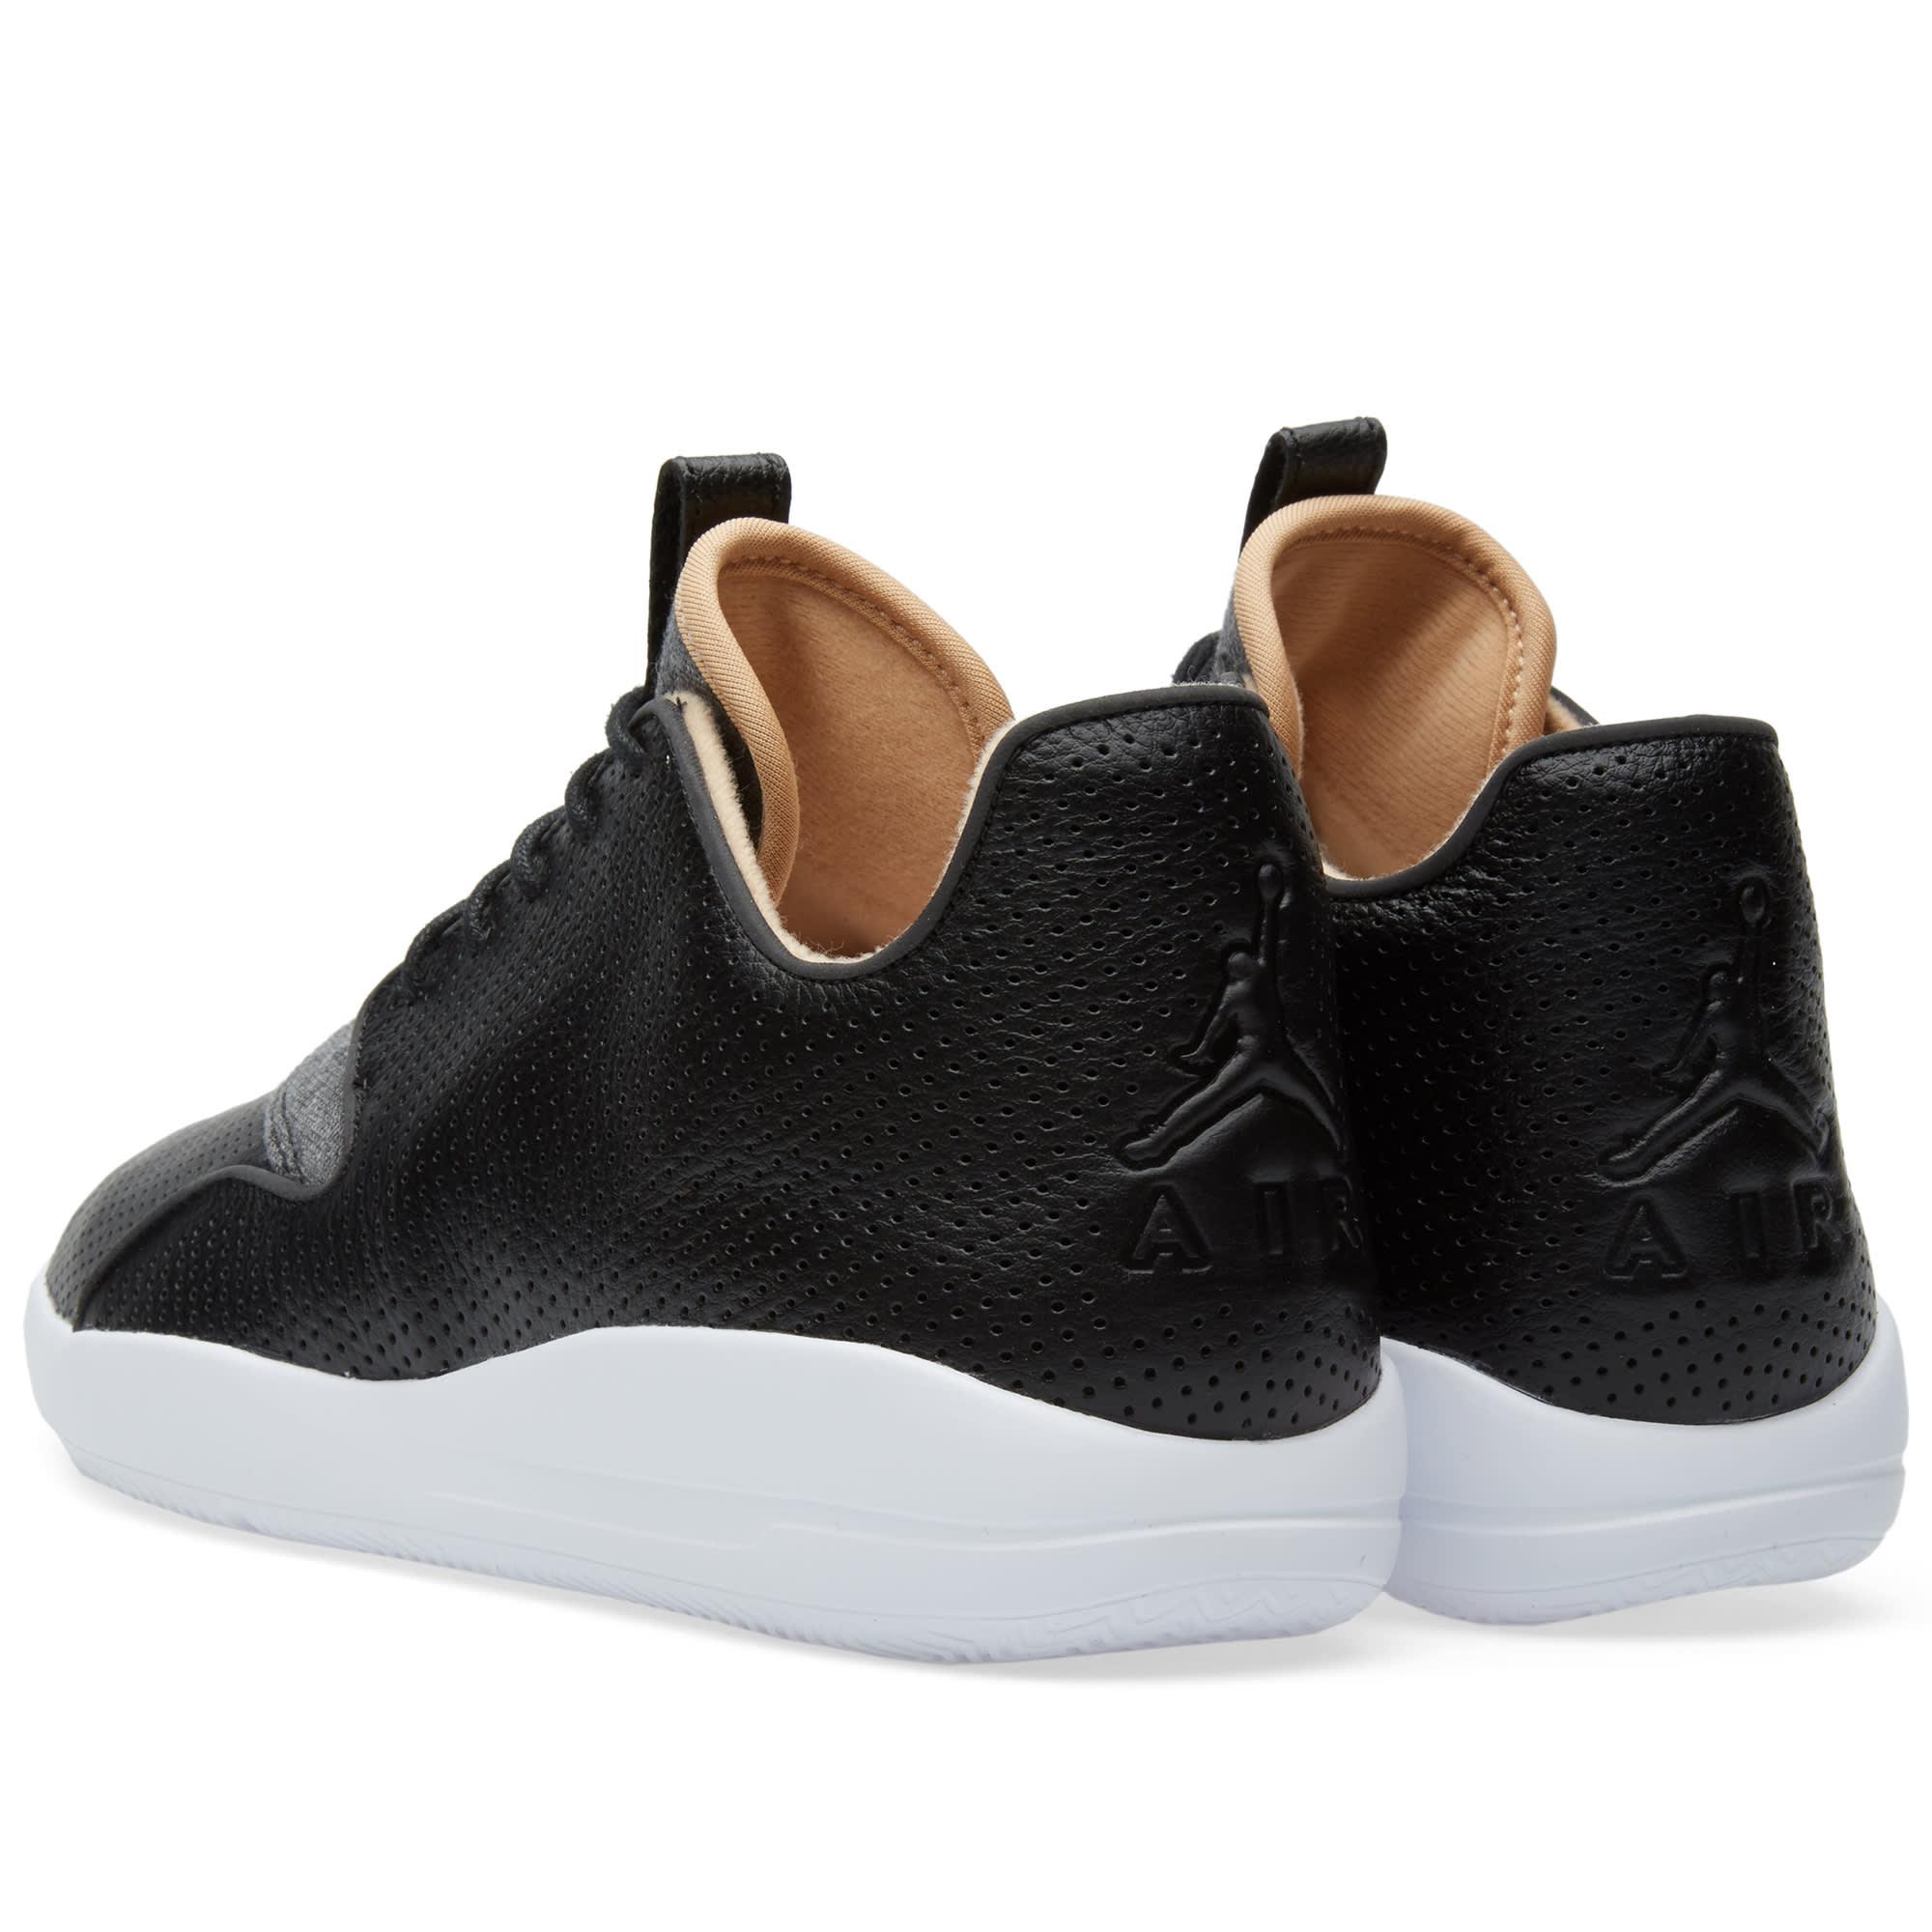 lowest price 9c8df 49a2a ... best jordan draft jordan popular air jordan 9 zapatos para hombre negro  07d72 49fb7